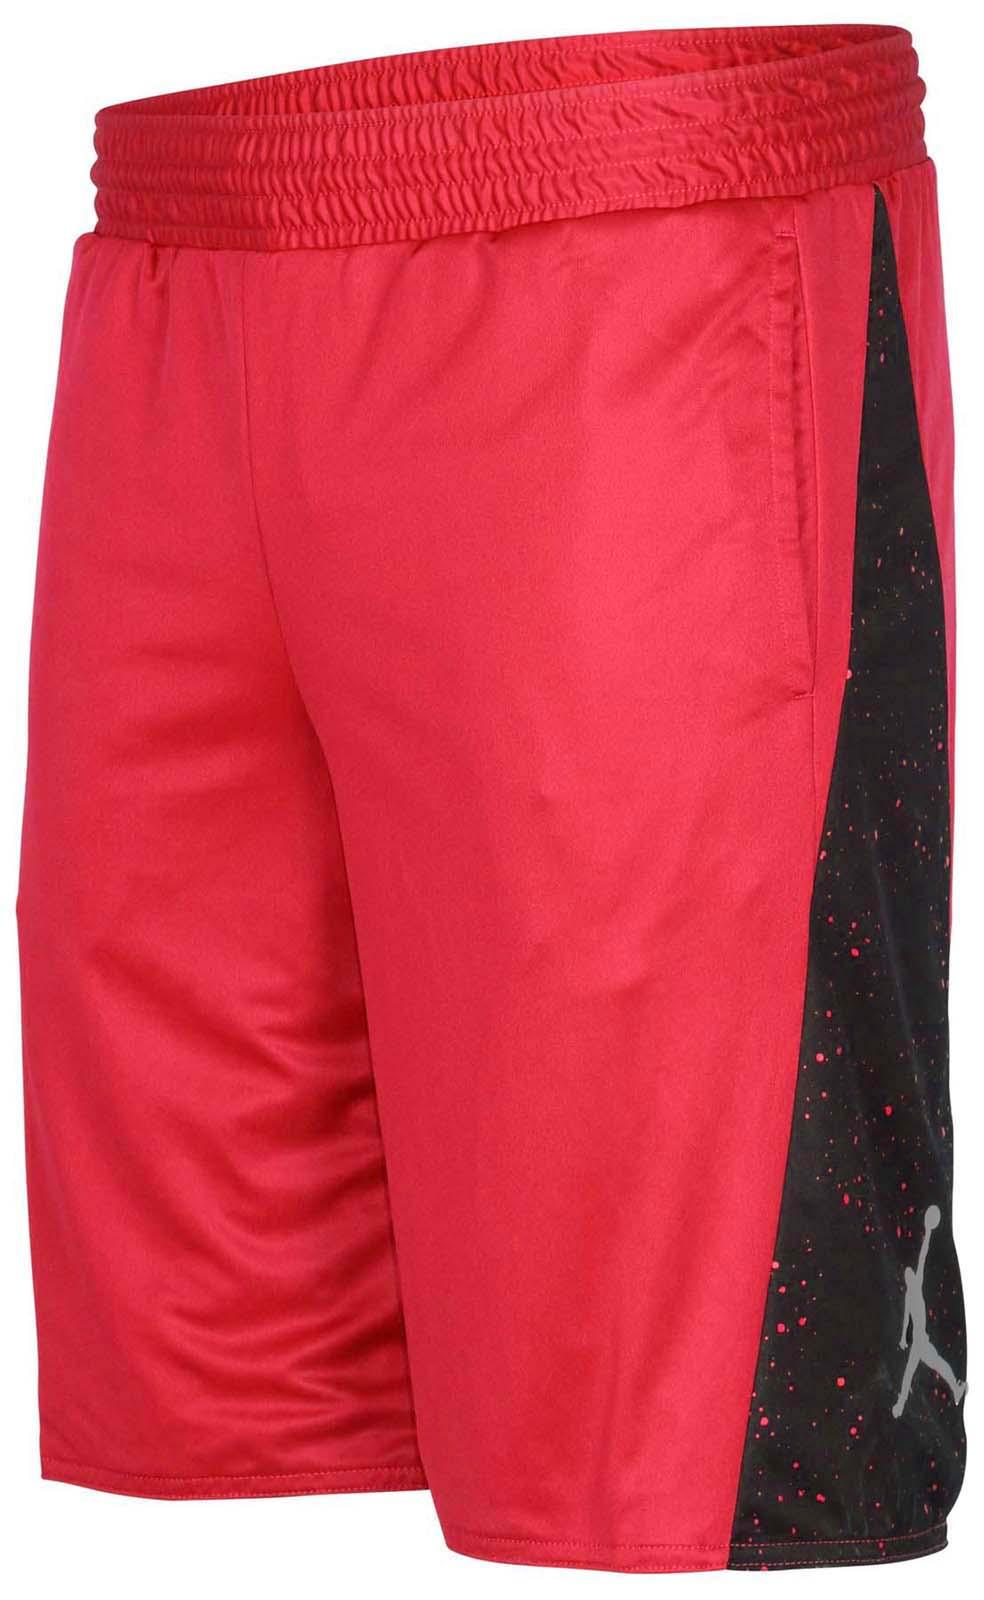 996e1da1a6c Jordan Men's Nike AJ V 5 Reversible Basketball Shorts   eBay